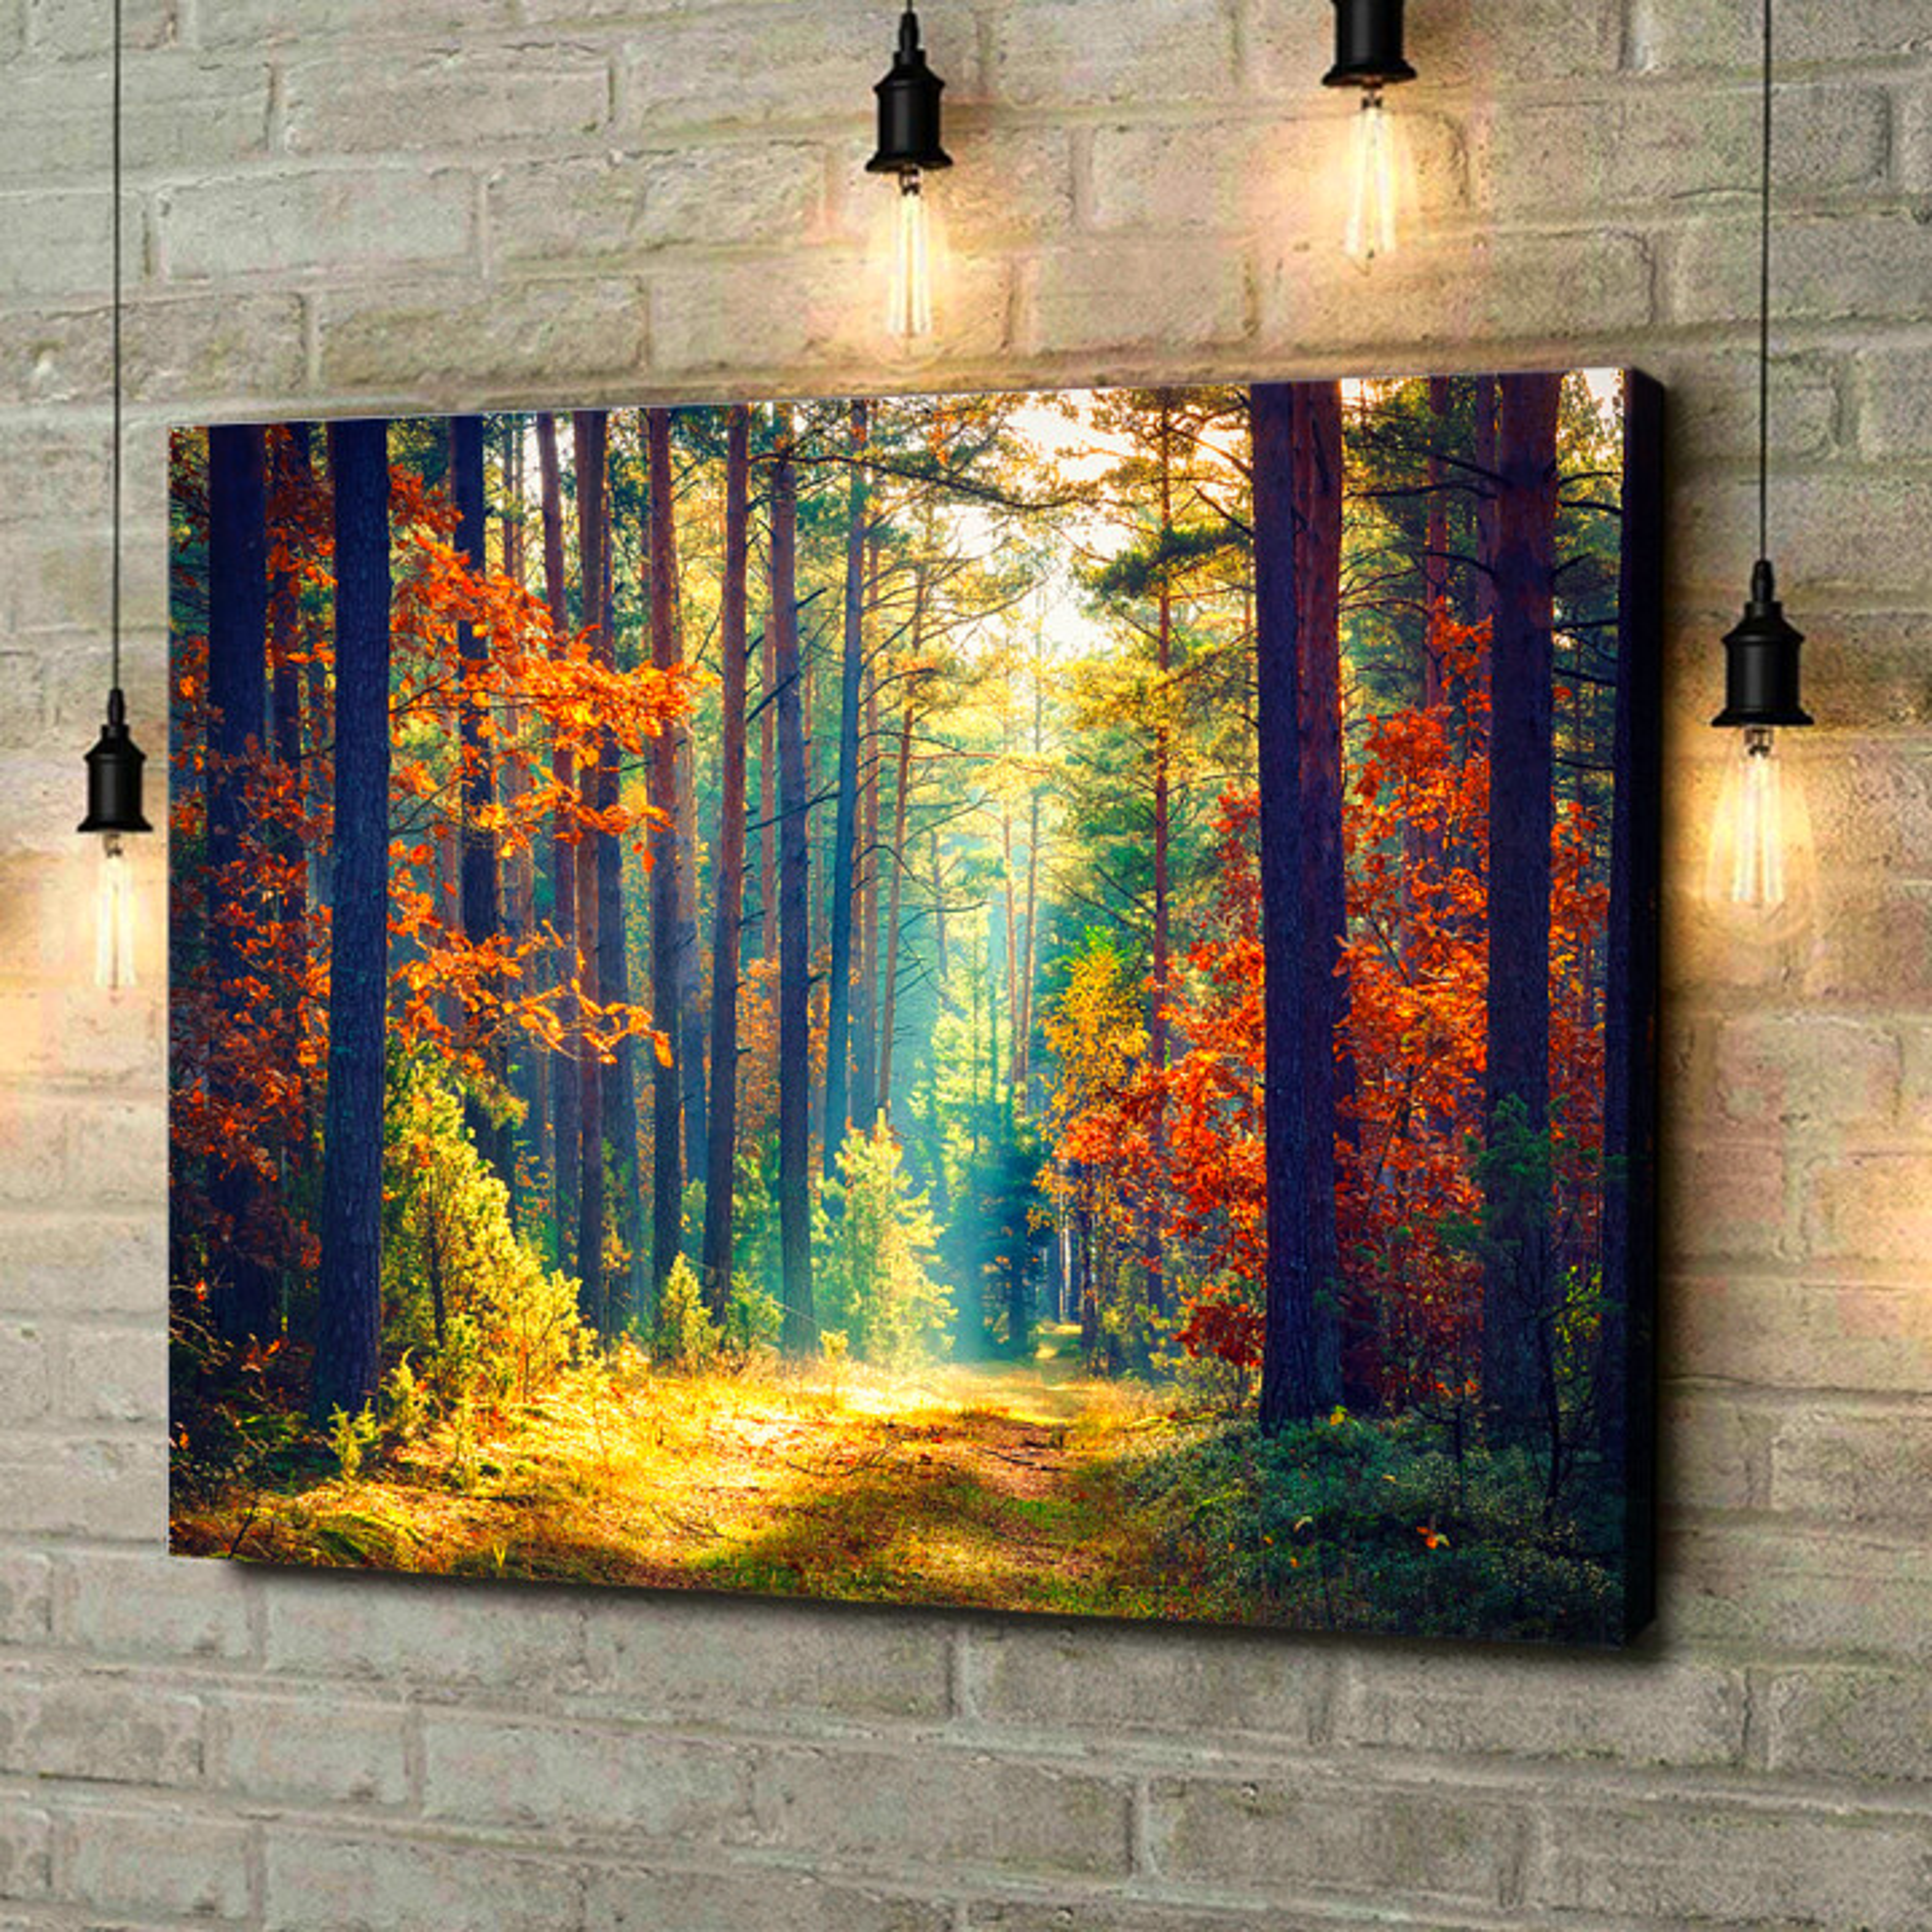 Leinwandbild personalisiert Herbstwald